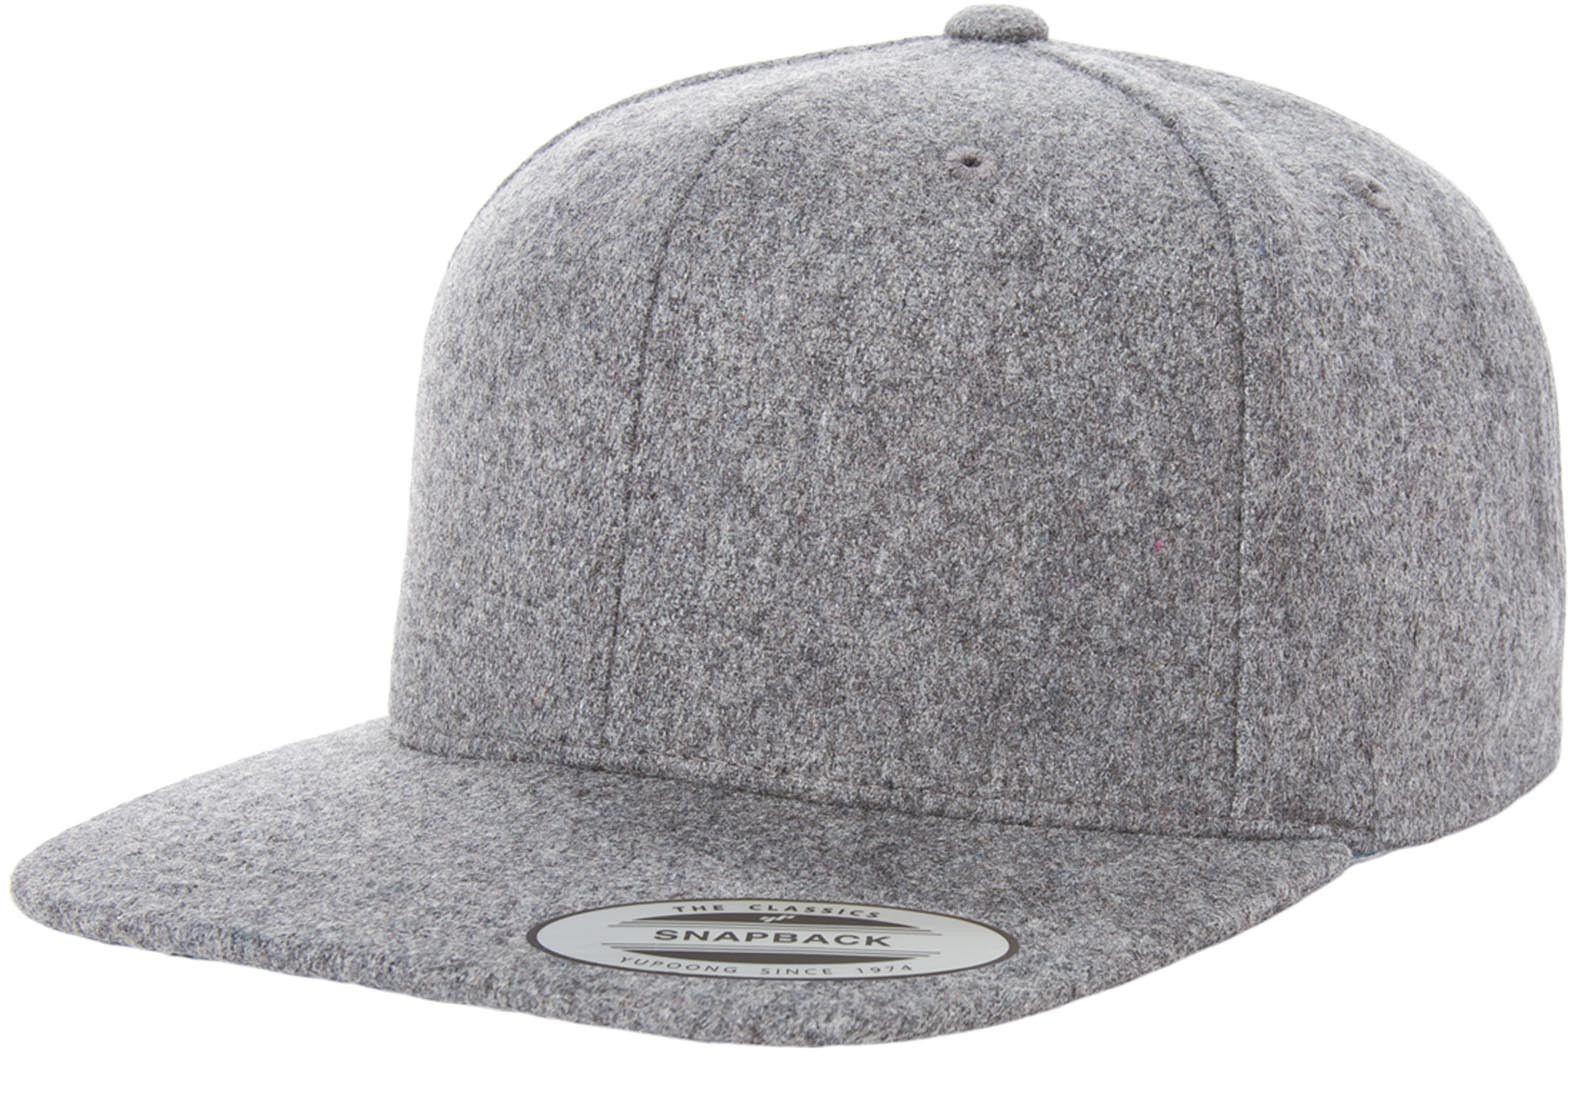 Flexfit Yupoong 6689m Melton Wool Snapback Hat Wholesale Heather Grey Hats Snapback Hats Melton